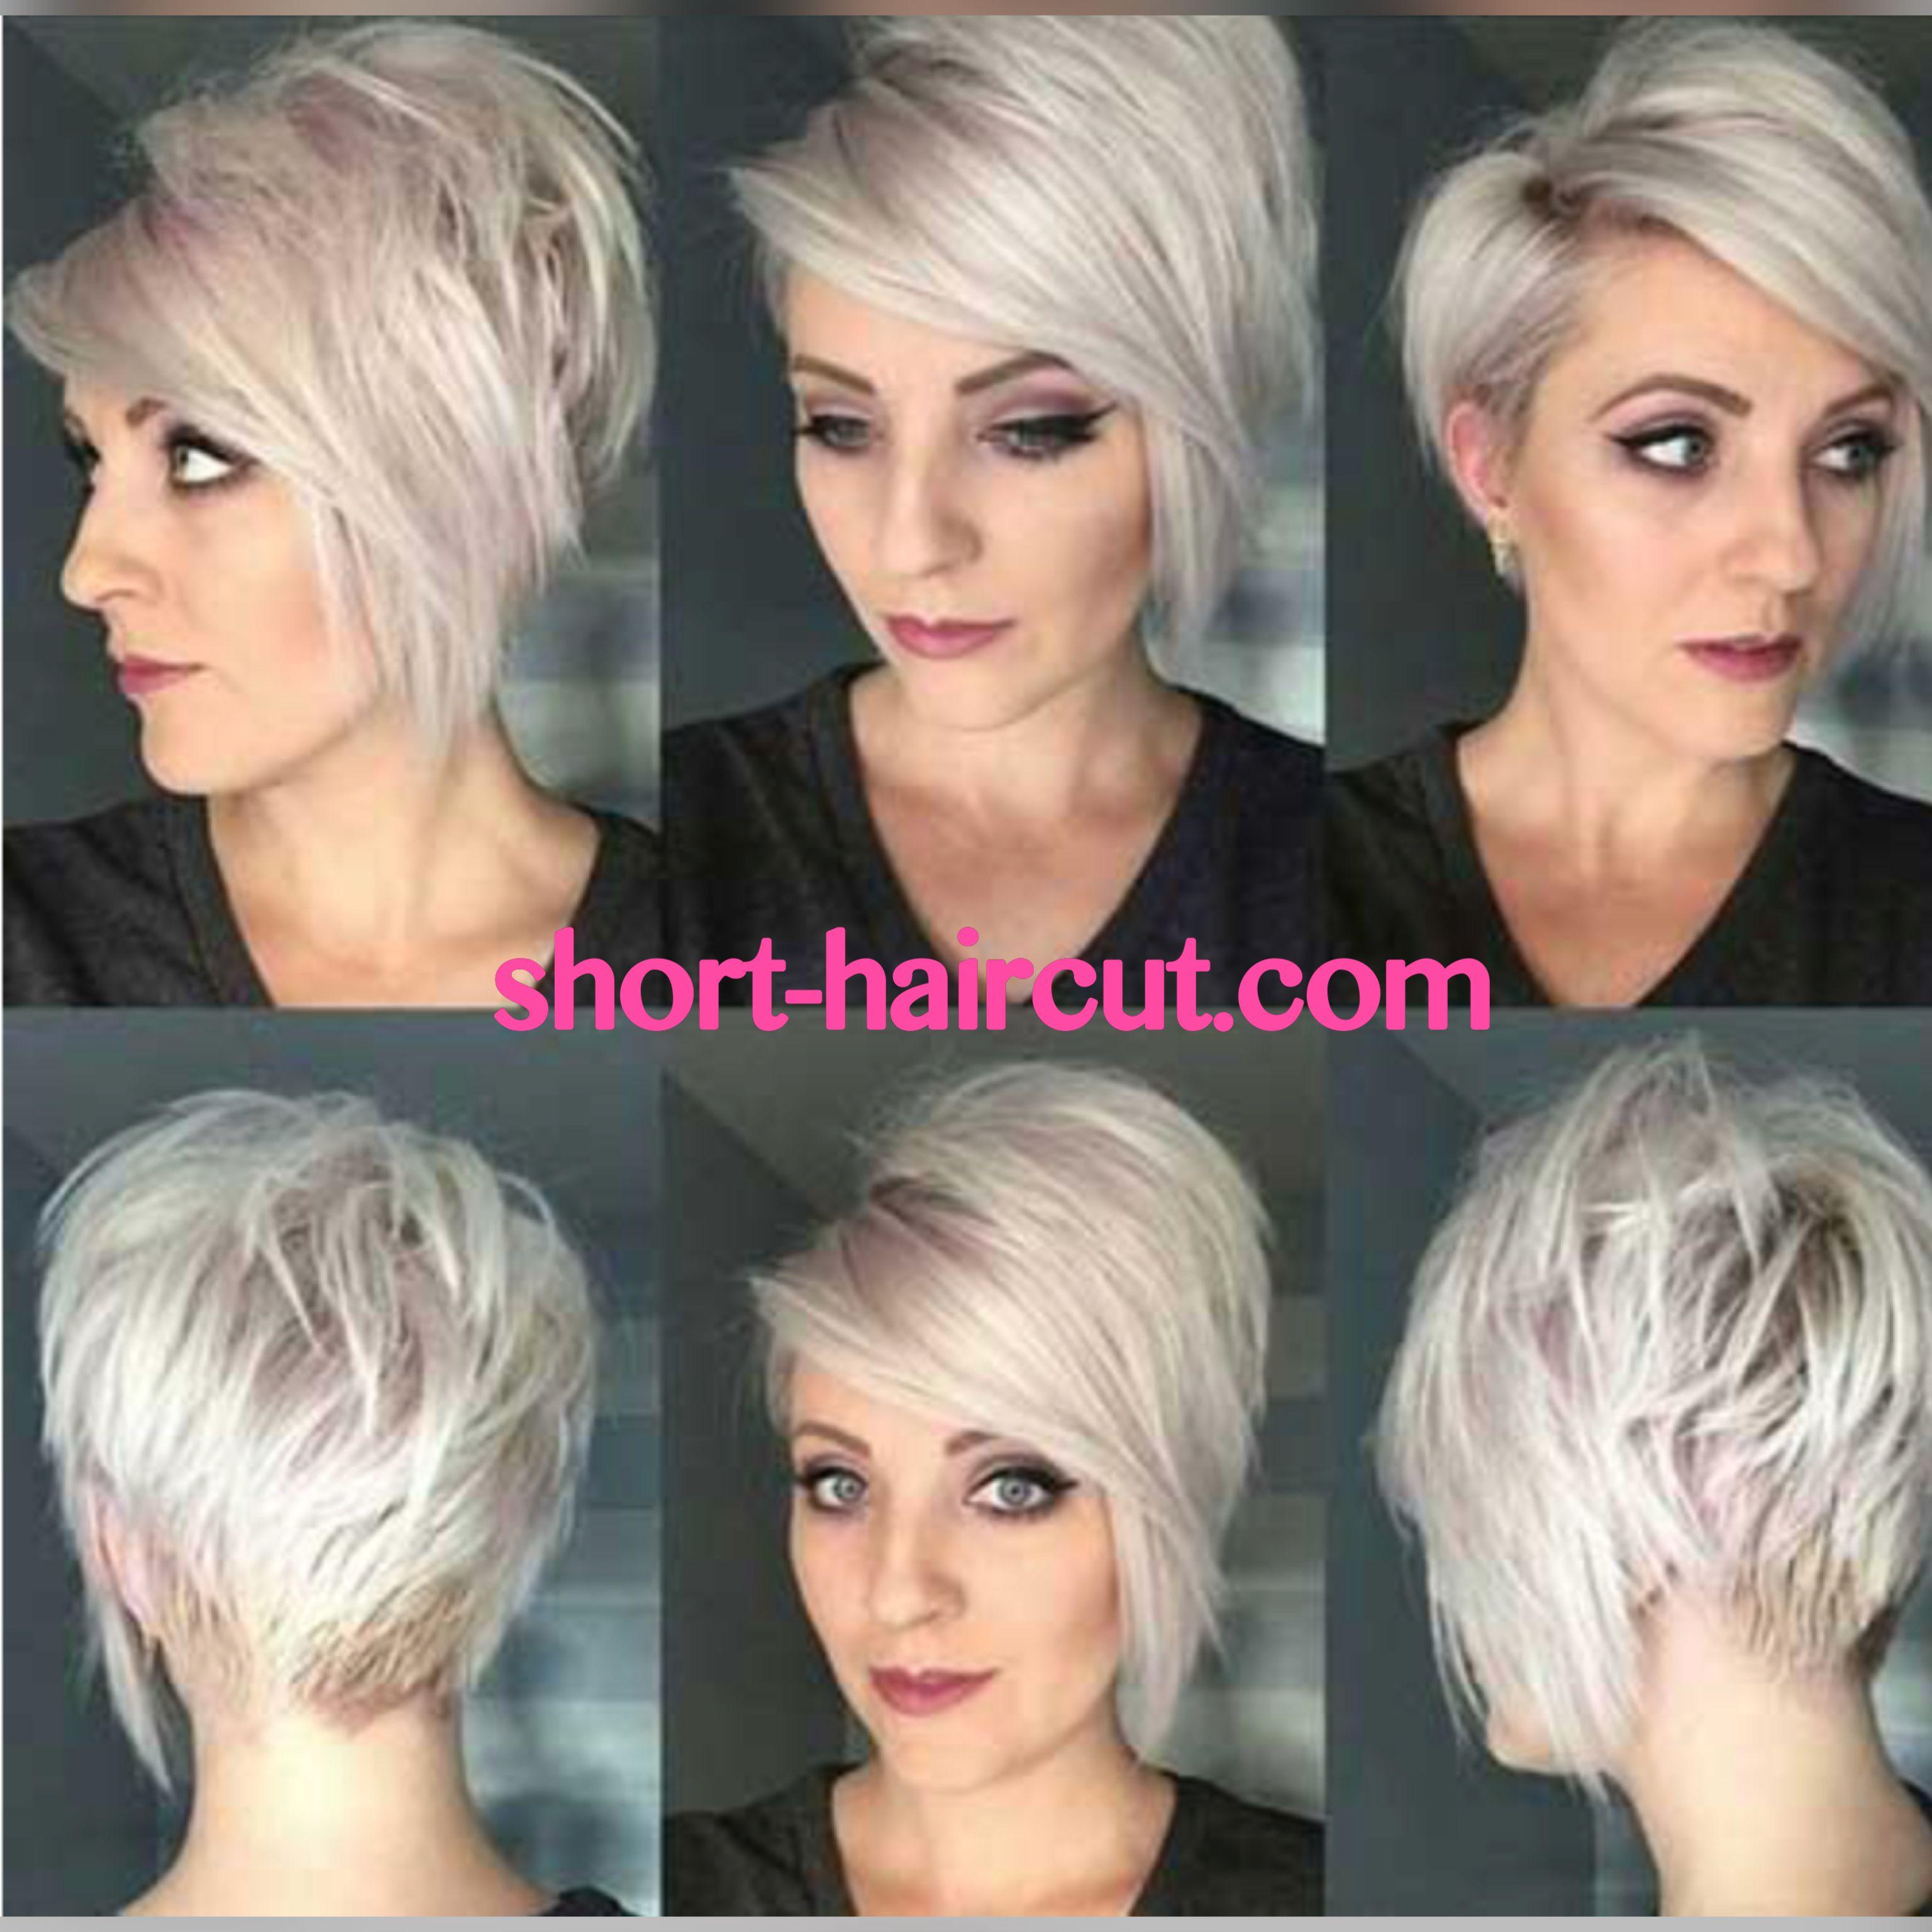 Pin by giorgia on tagli di capelli pinterest shapes hair makeup